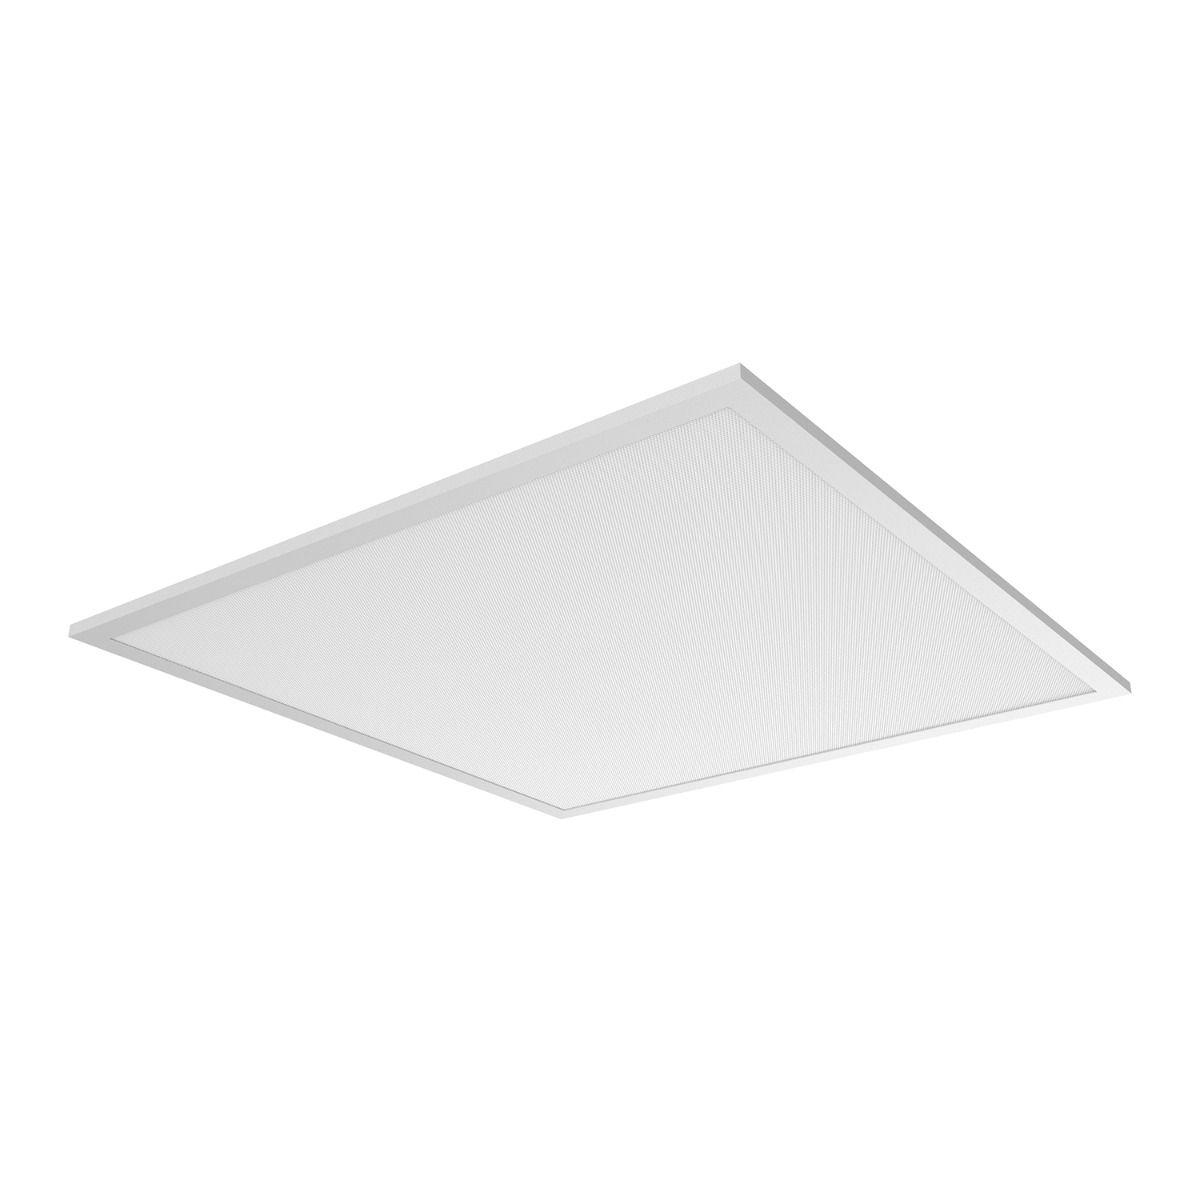 Noxion LED Panel Delta Pro V3 Highlum DALI 36W 3000K 5225lm 60x60cm UGR <19   Warm White - Replaces 4x18W